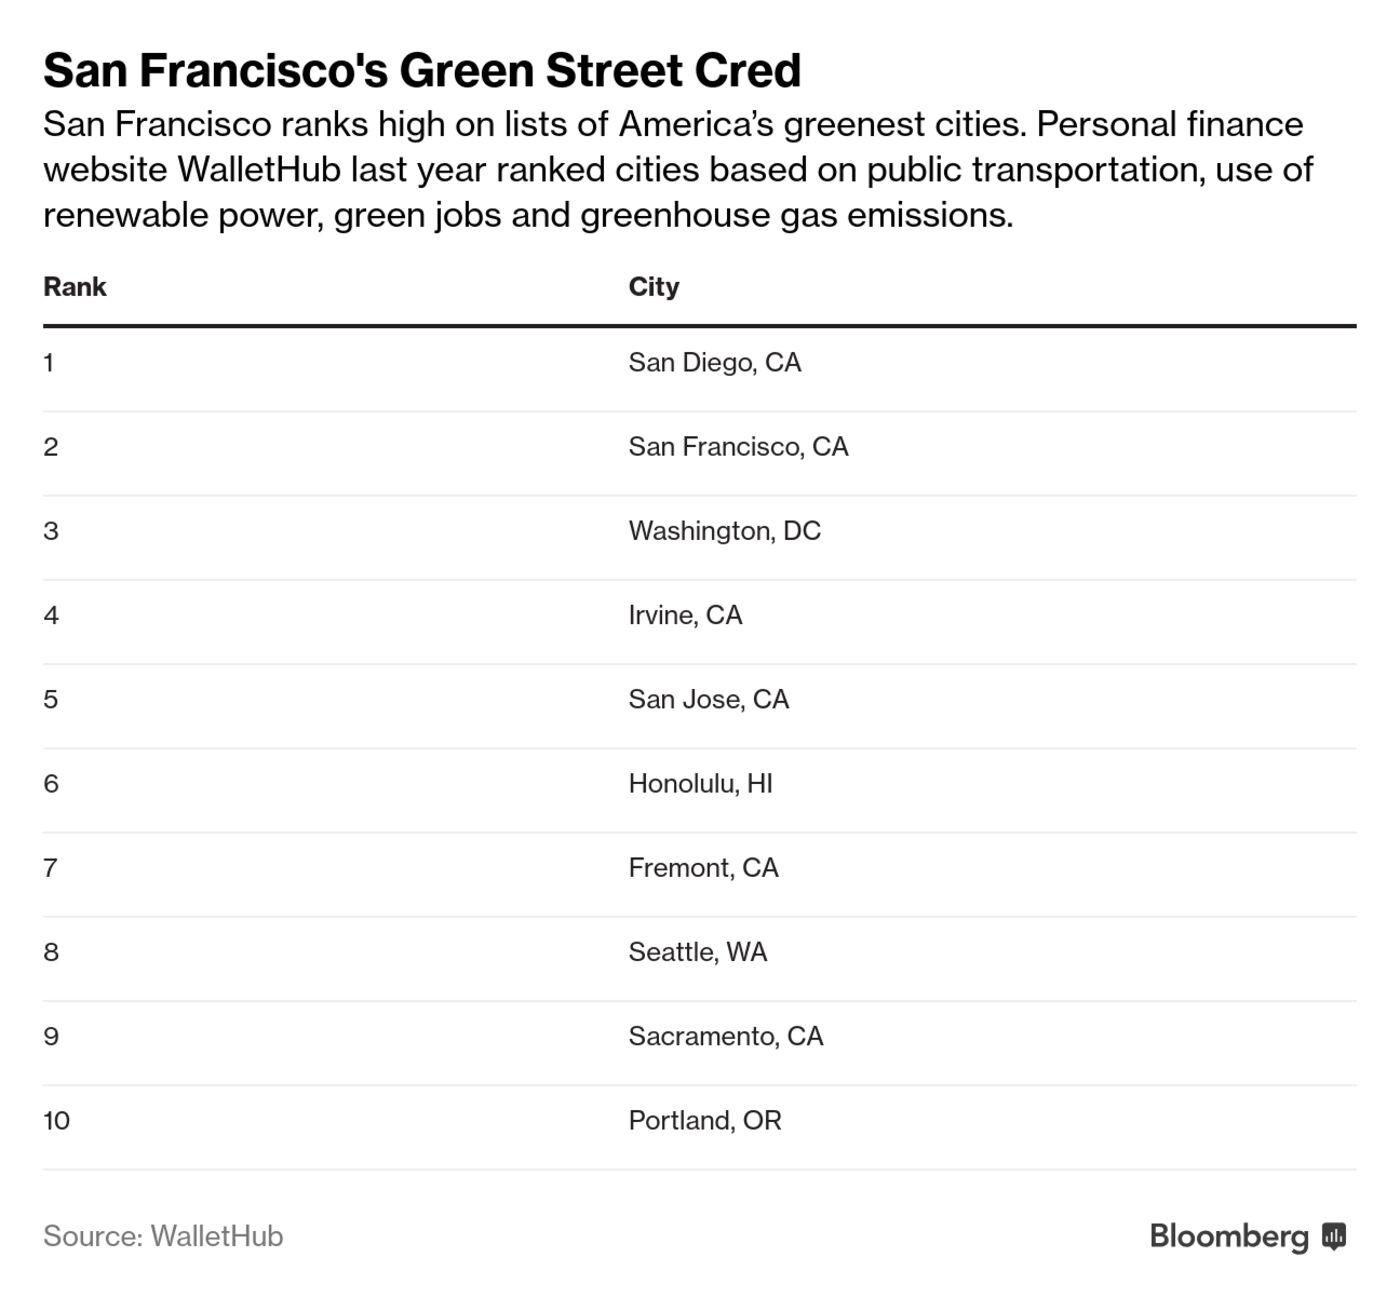 San Francisco's Green Street Cred